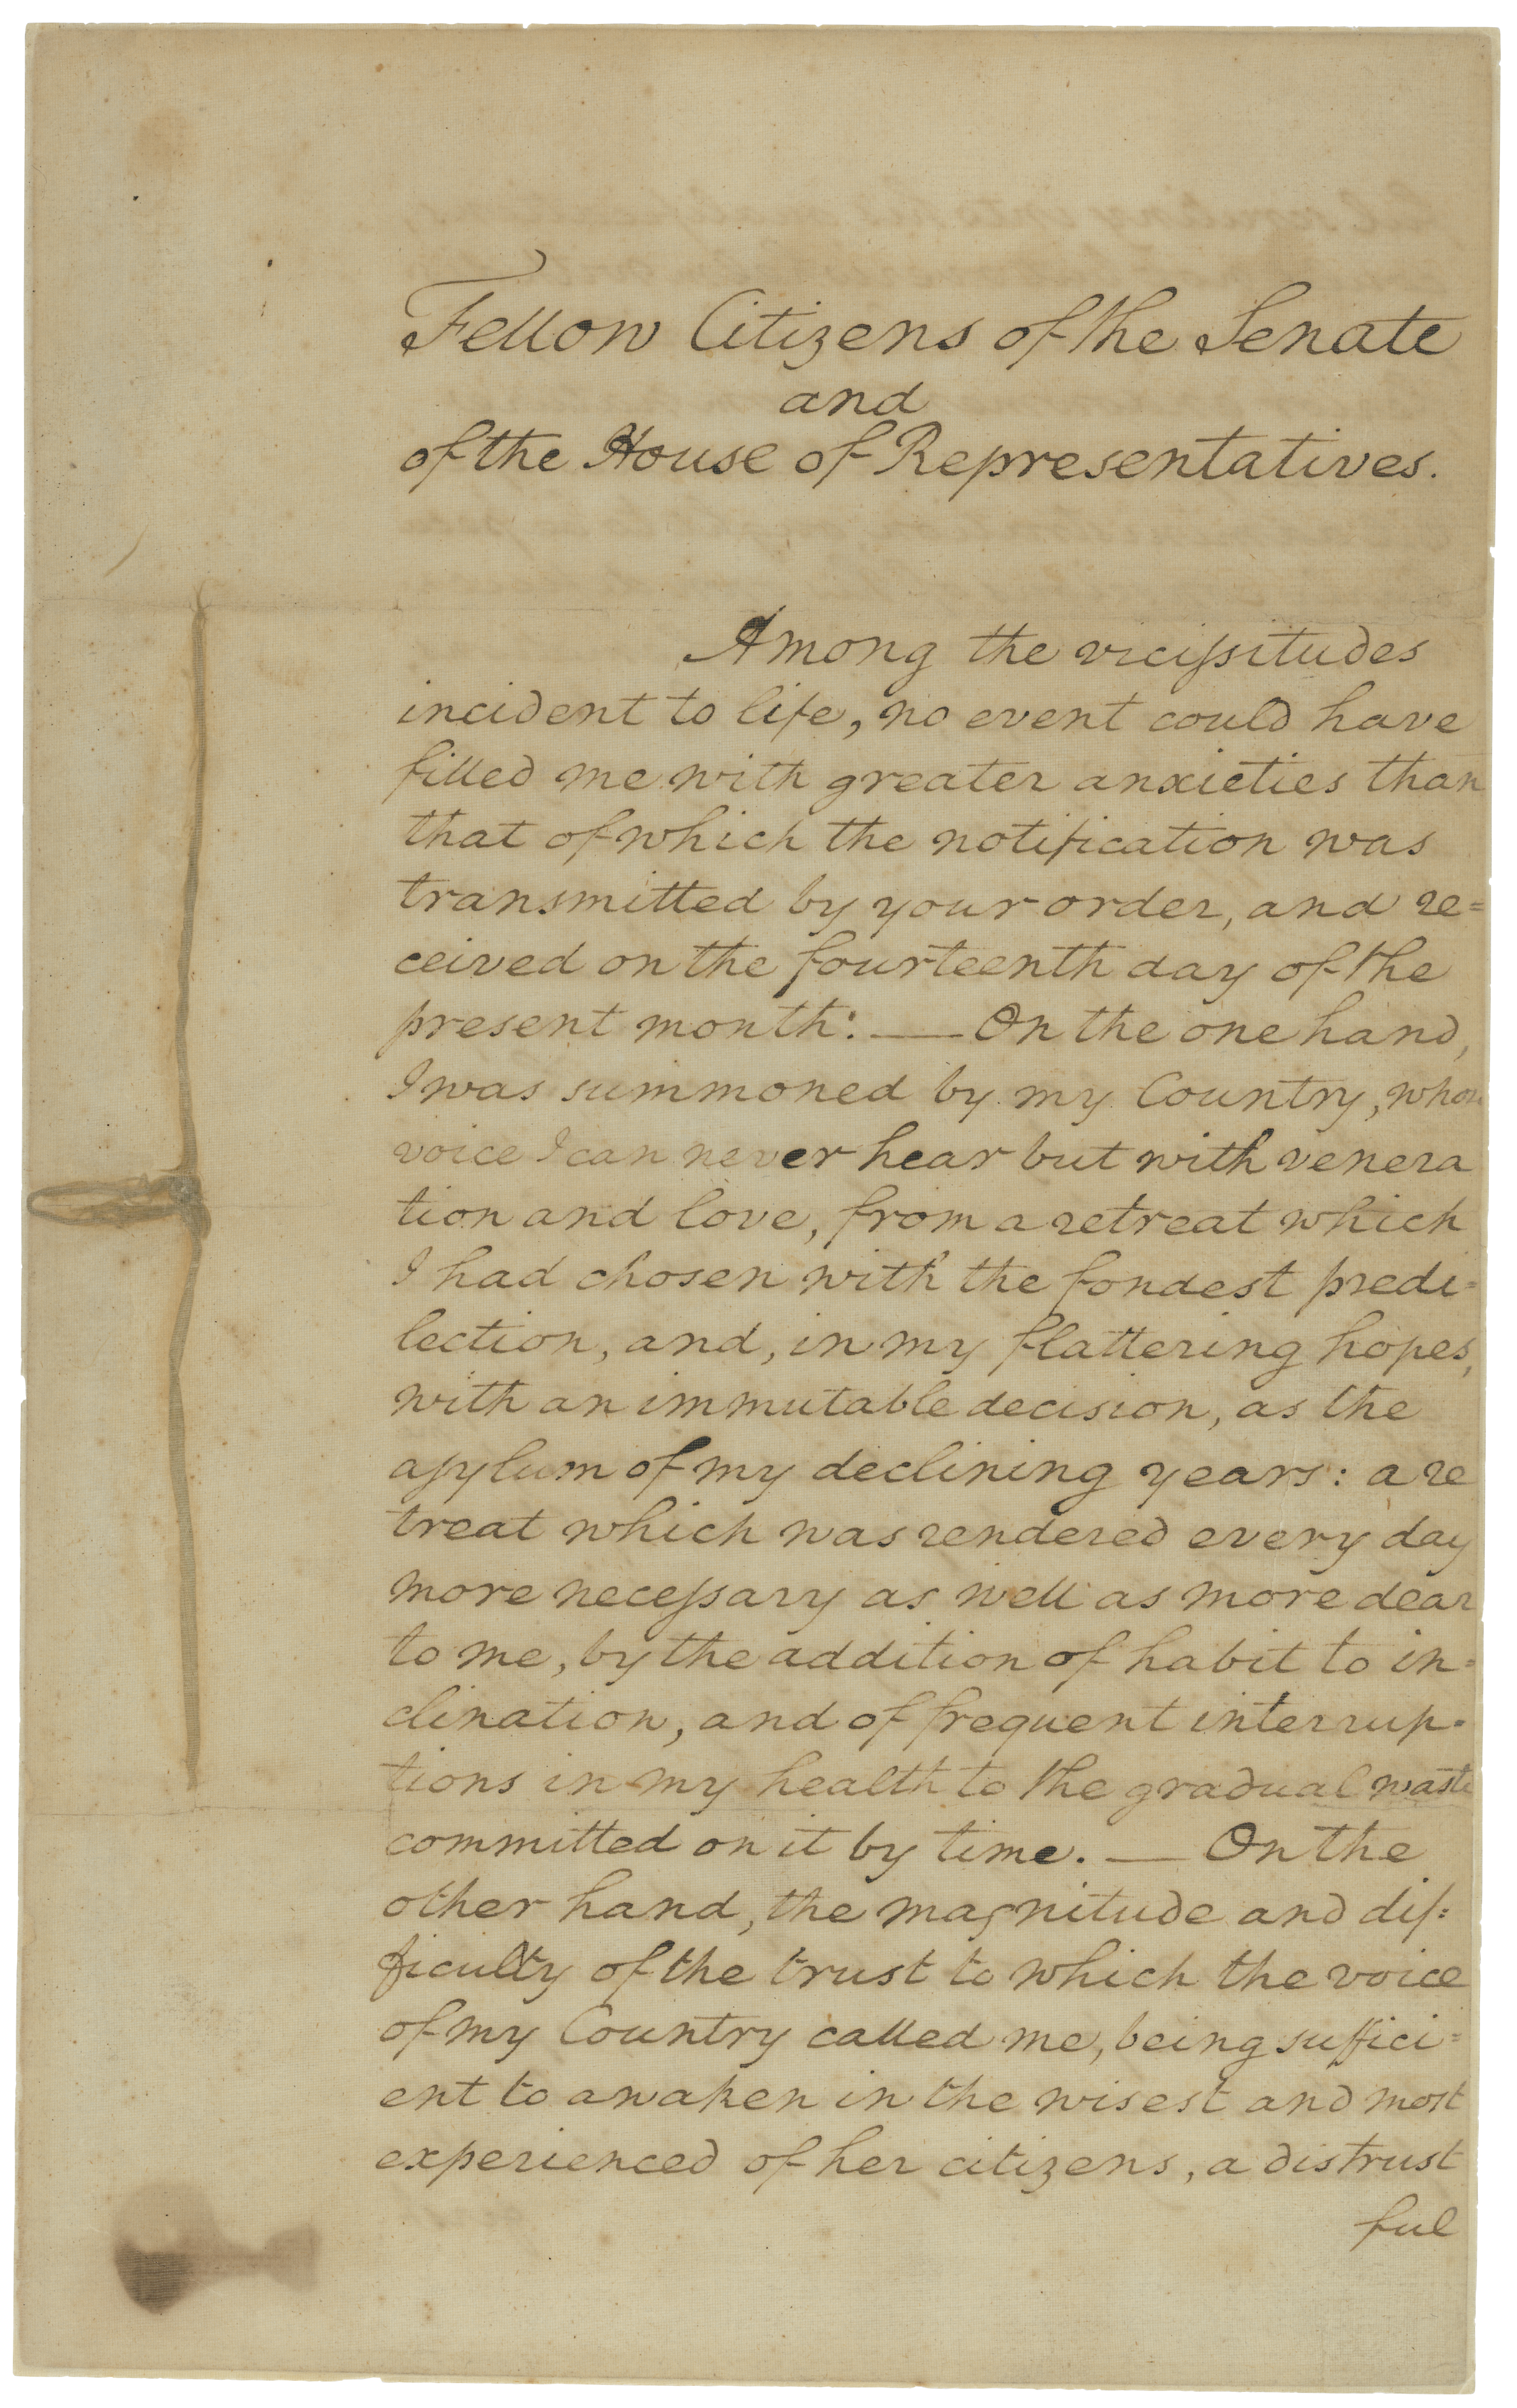 Washington Inaugural Address Page 1